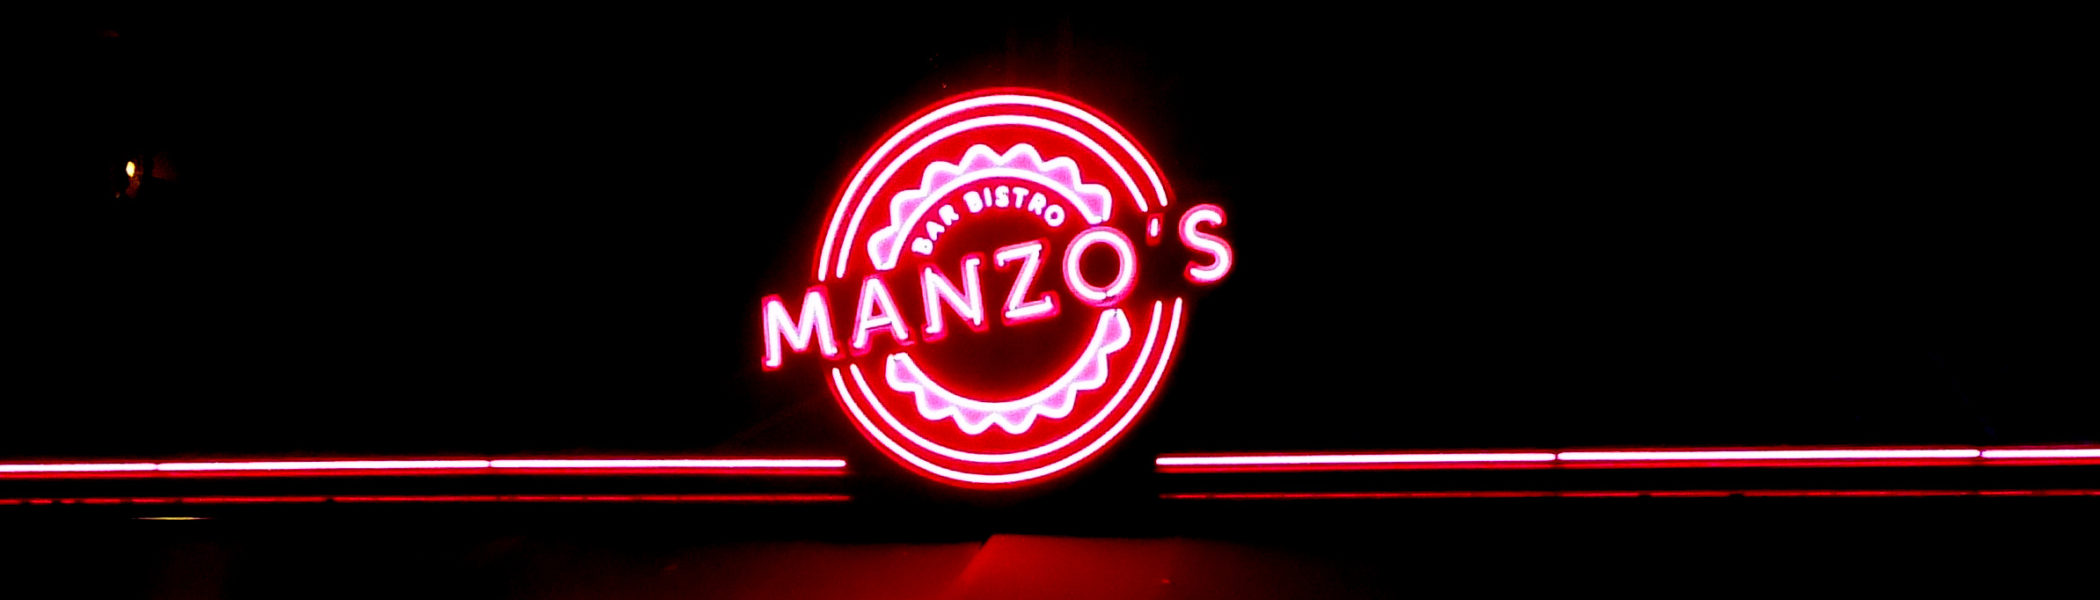 restaurant-zaandam-manzo-bar-bistro-gevel-neonreclame